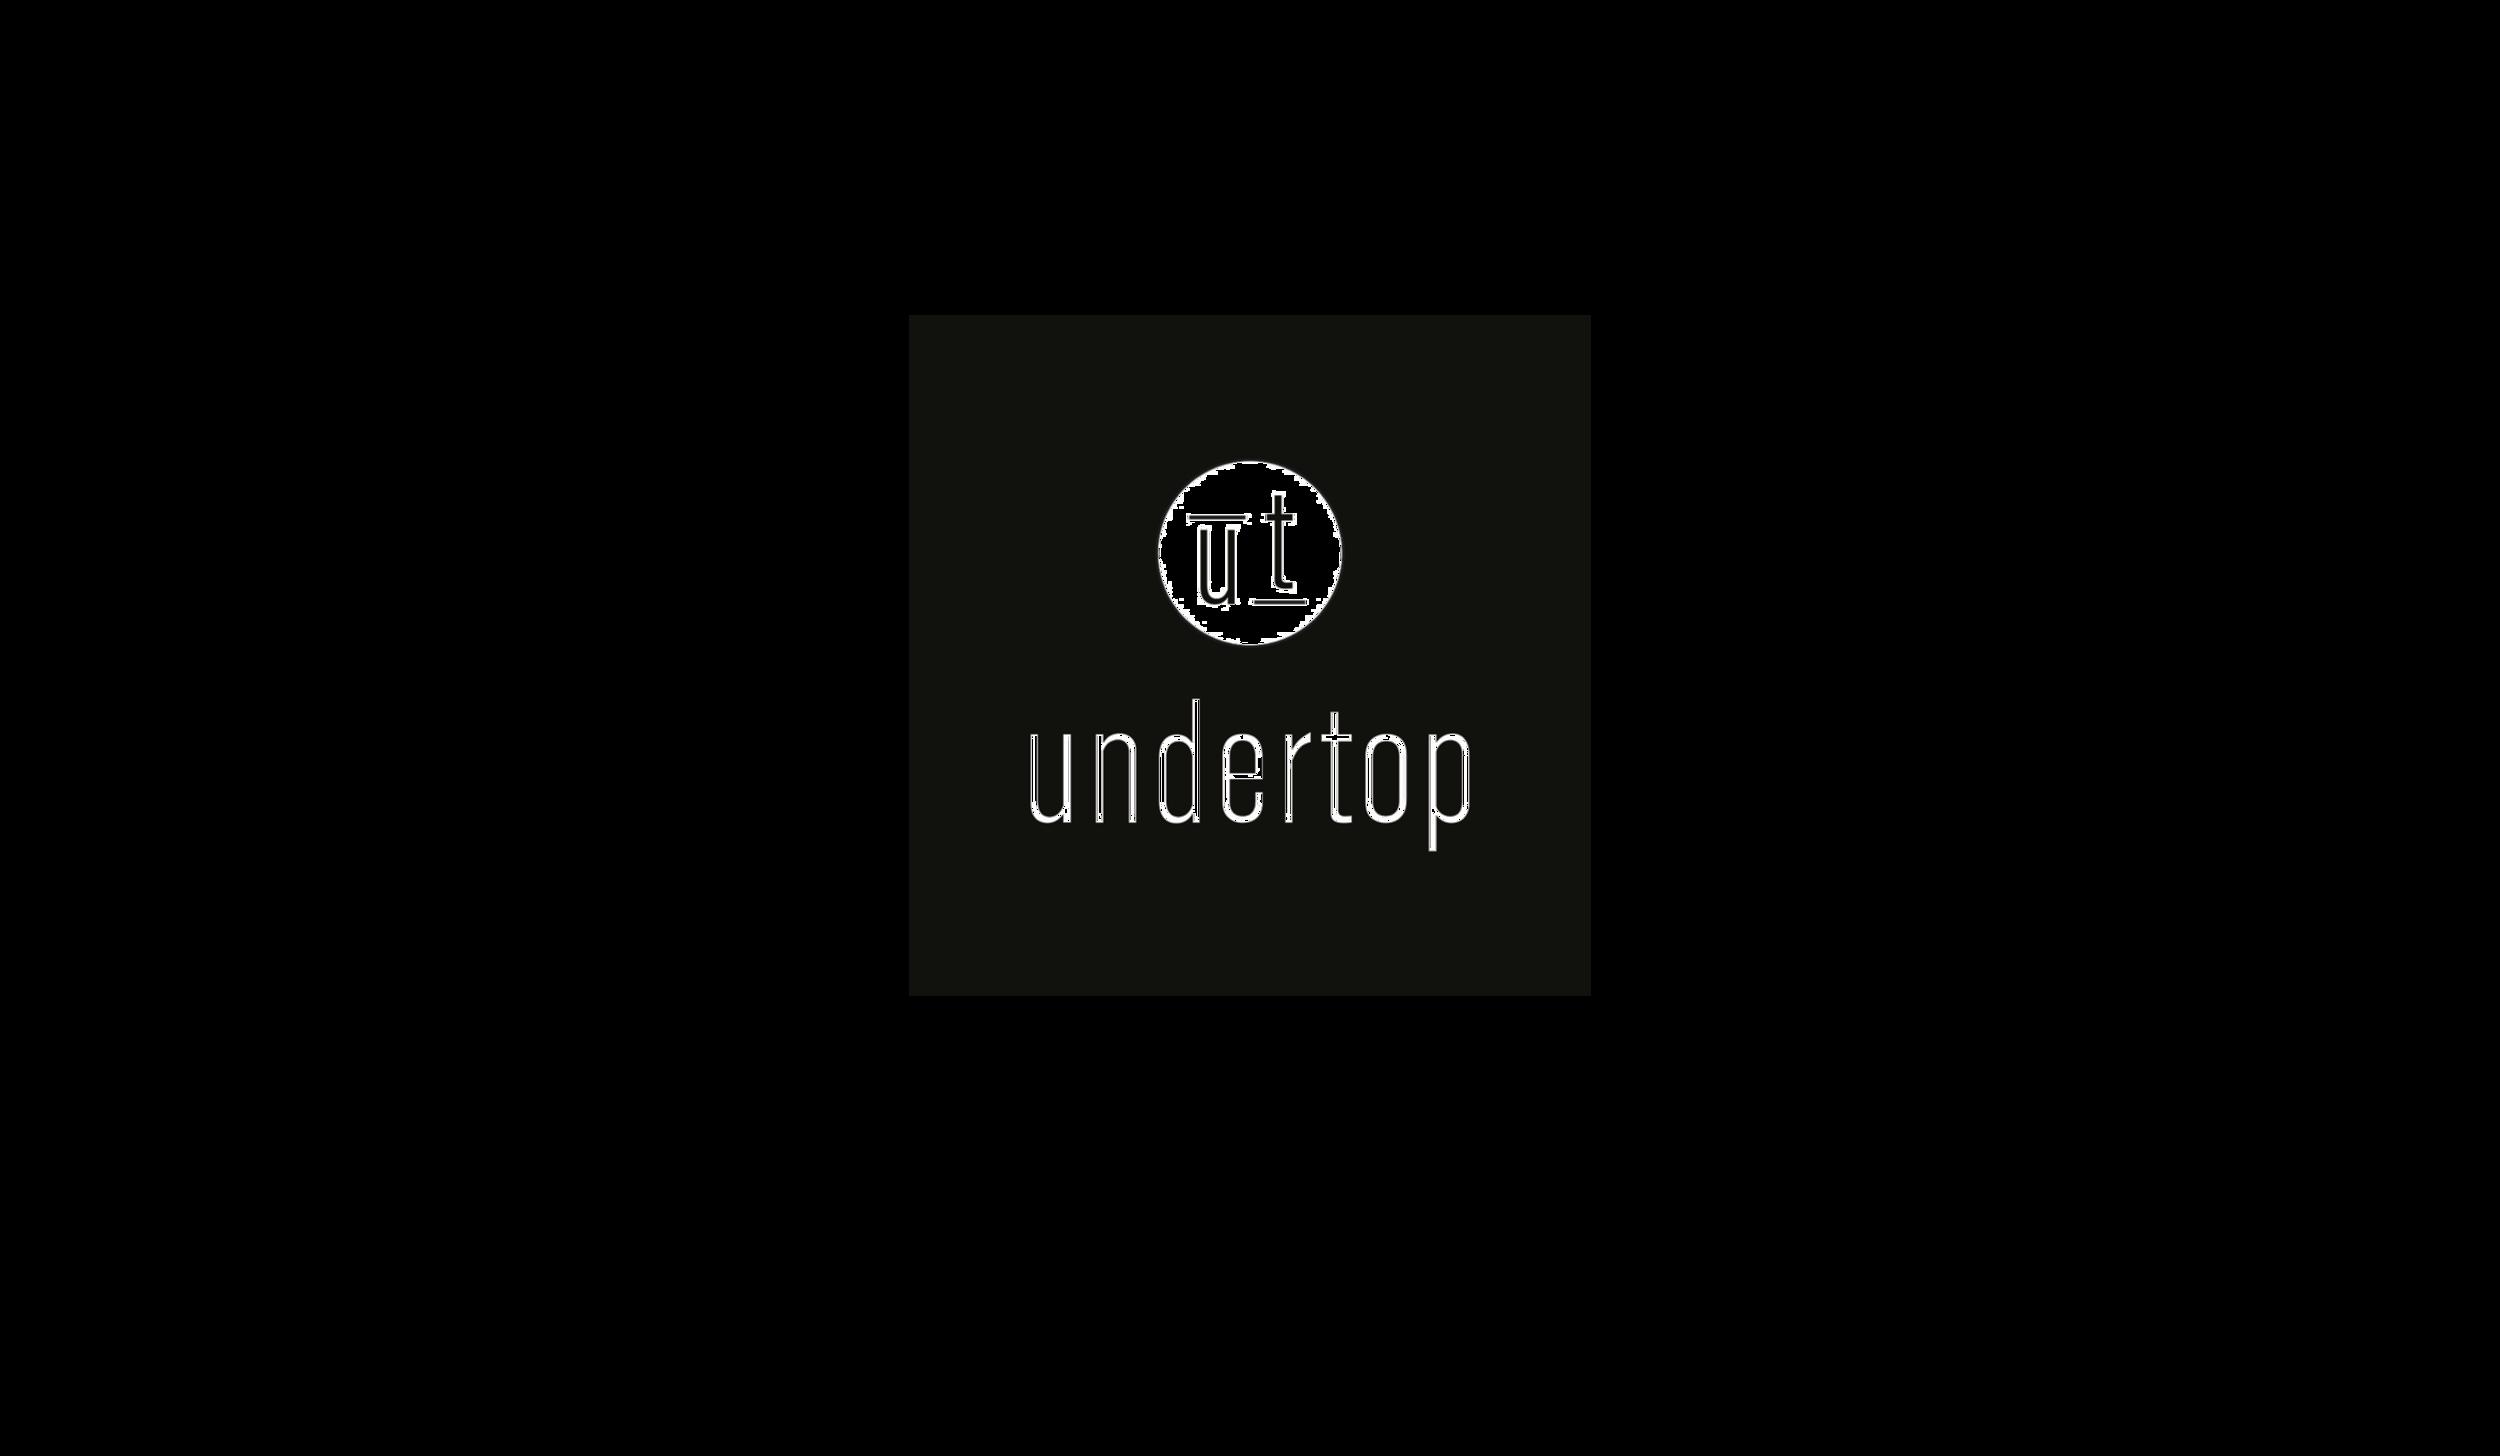 Untitled1-copy_0023_logo_undertop.jpeg.png